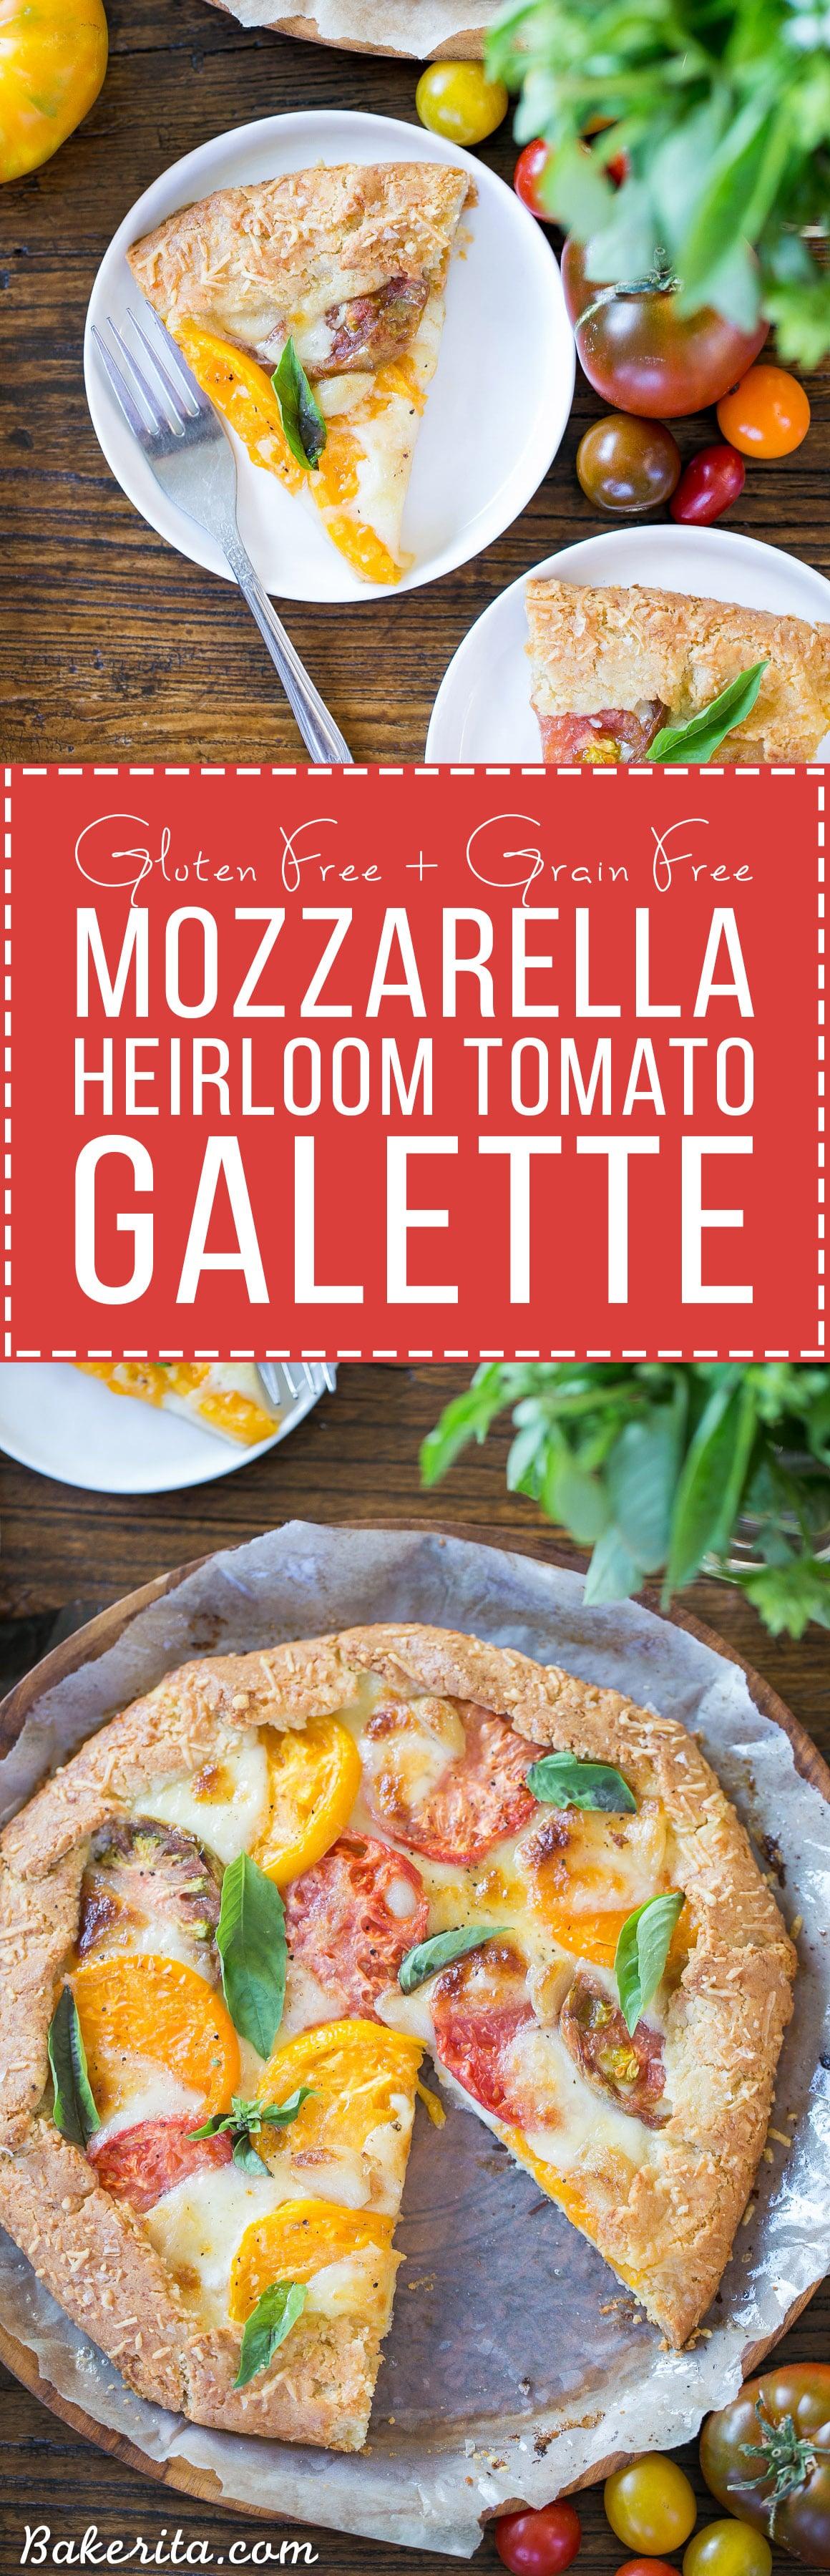 Heirloom Tomato Galette showcases beautiful heirloom tomatoes ...